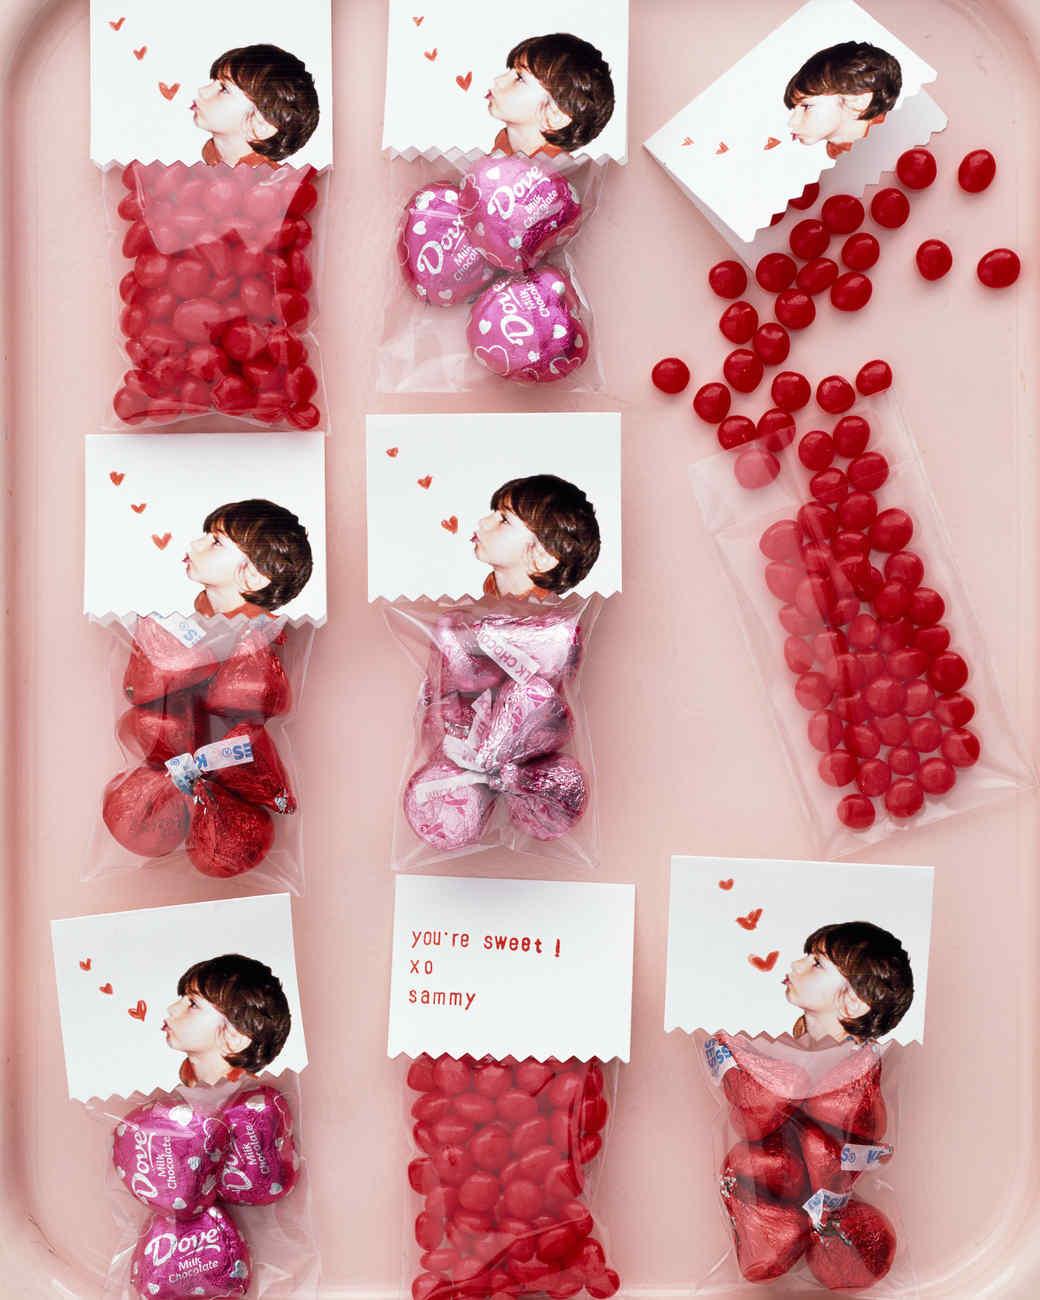 mla102749_0207_candy_bag.jpg